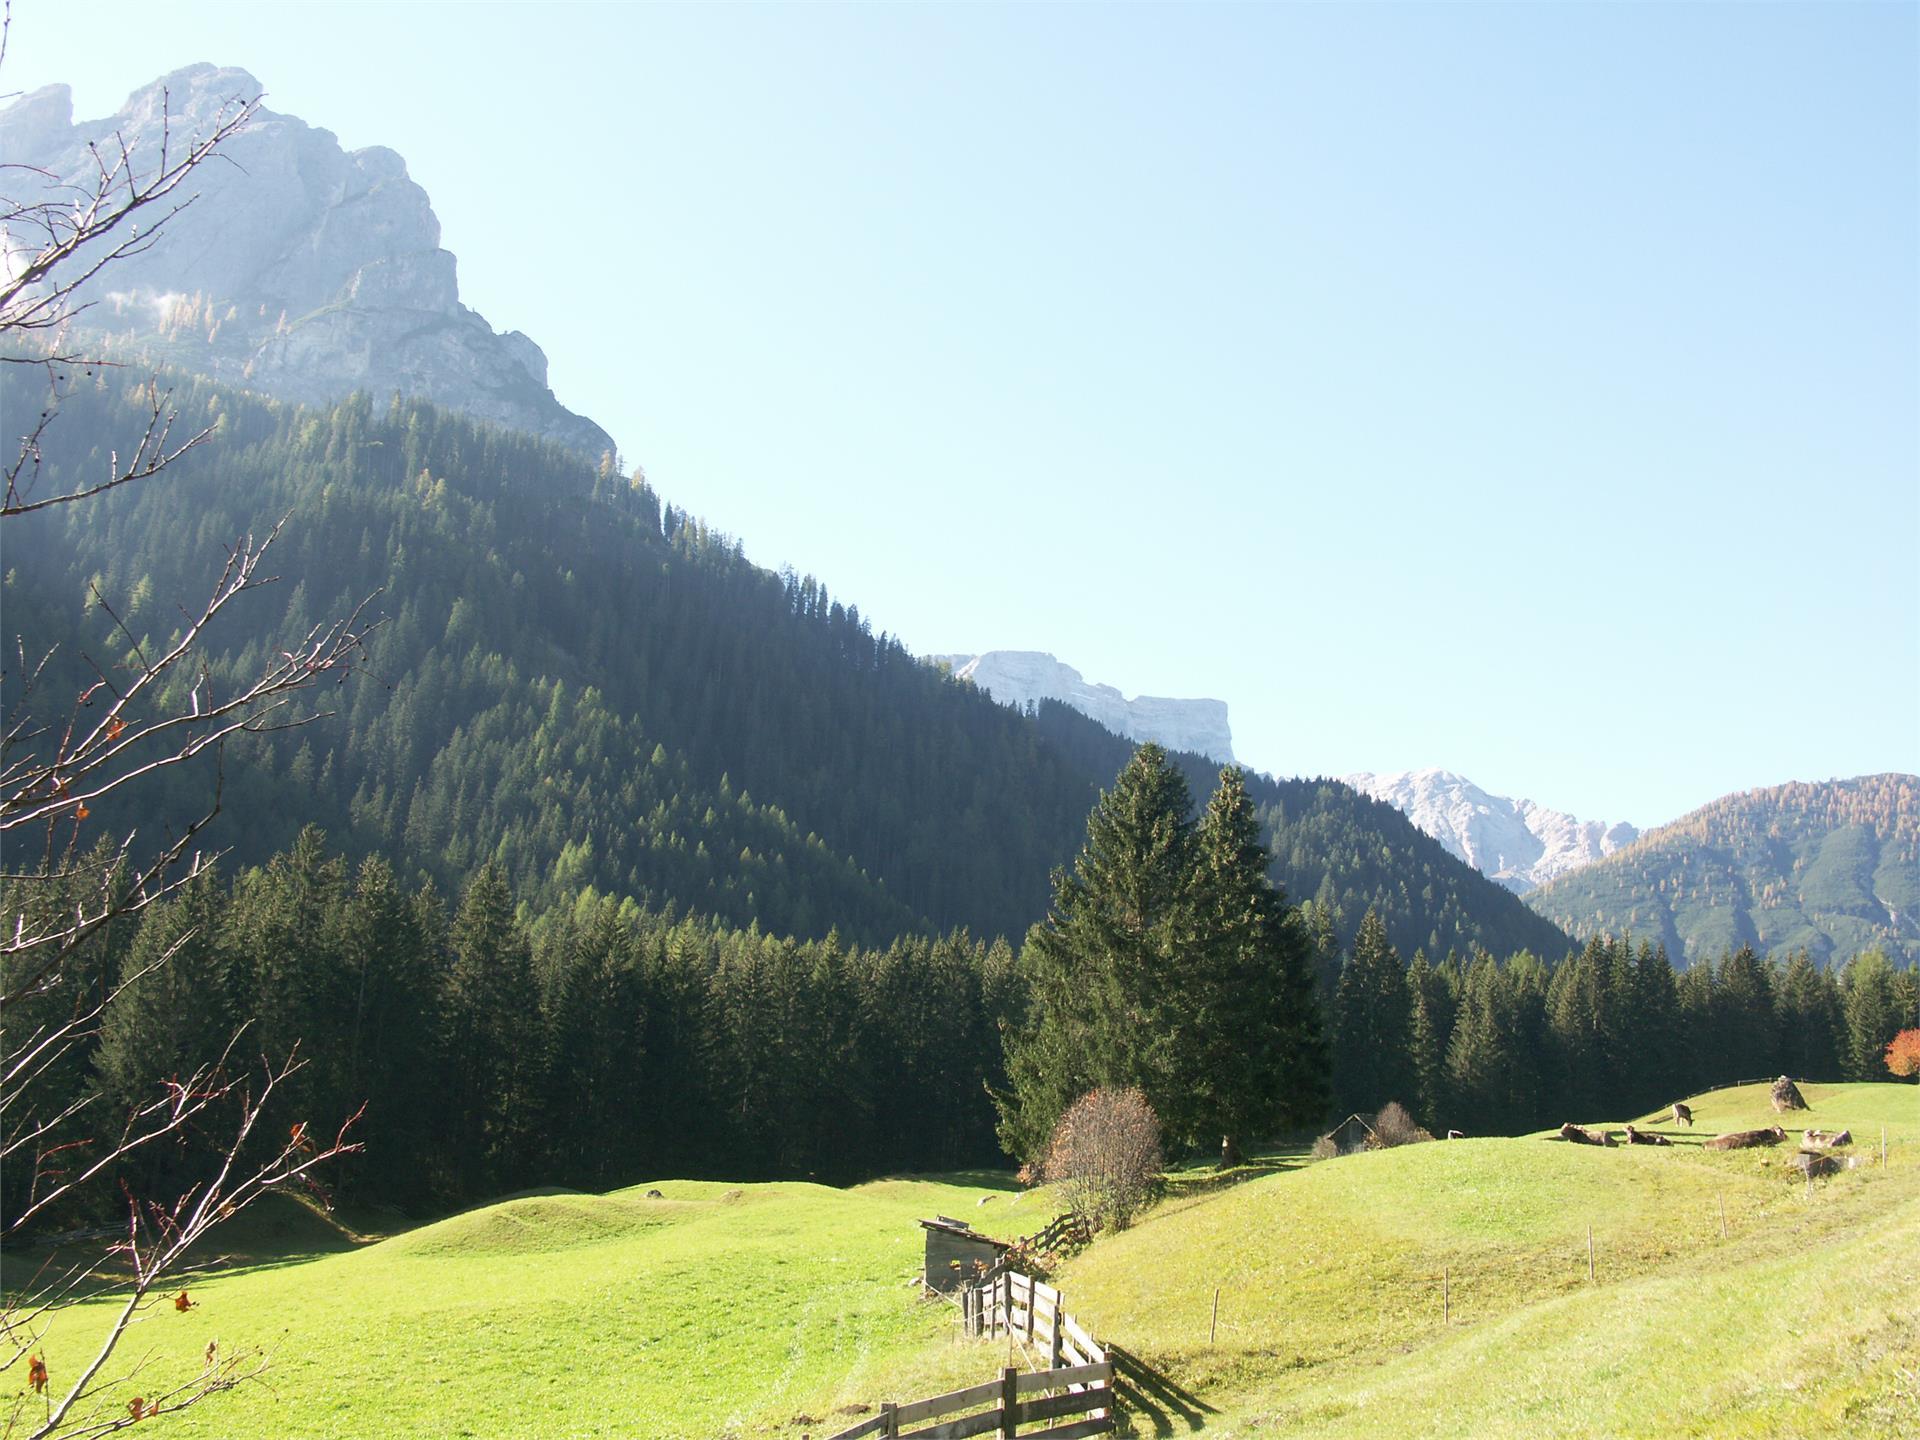 Monte di Braies